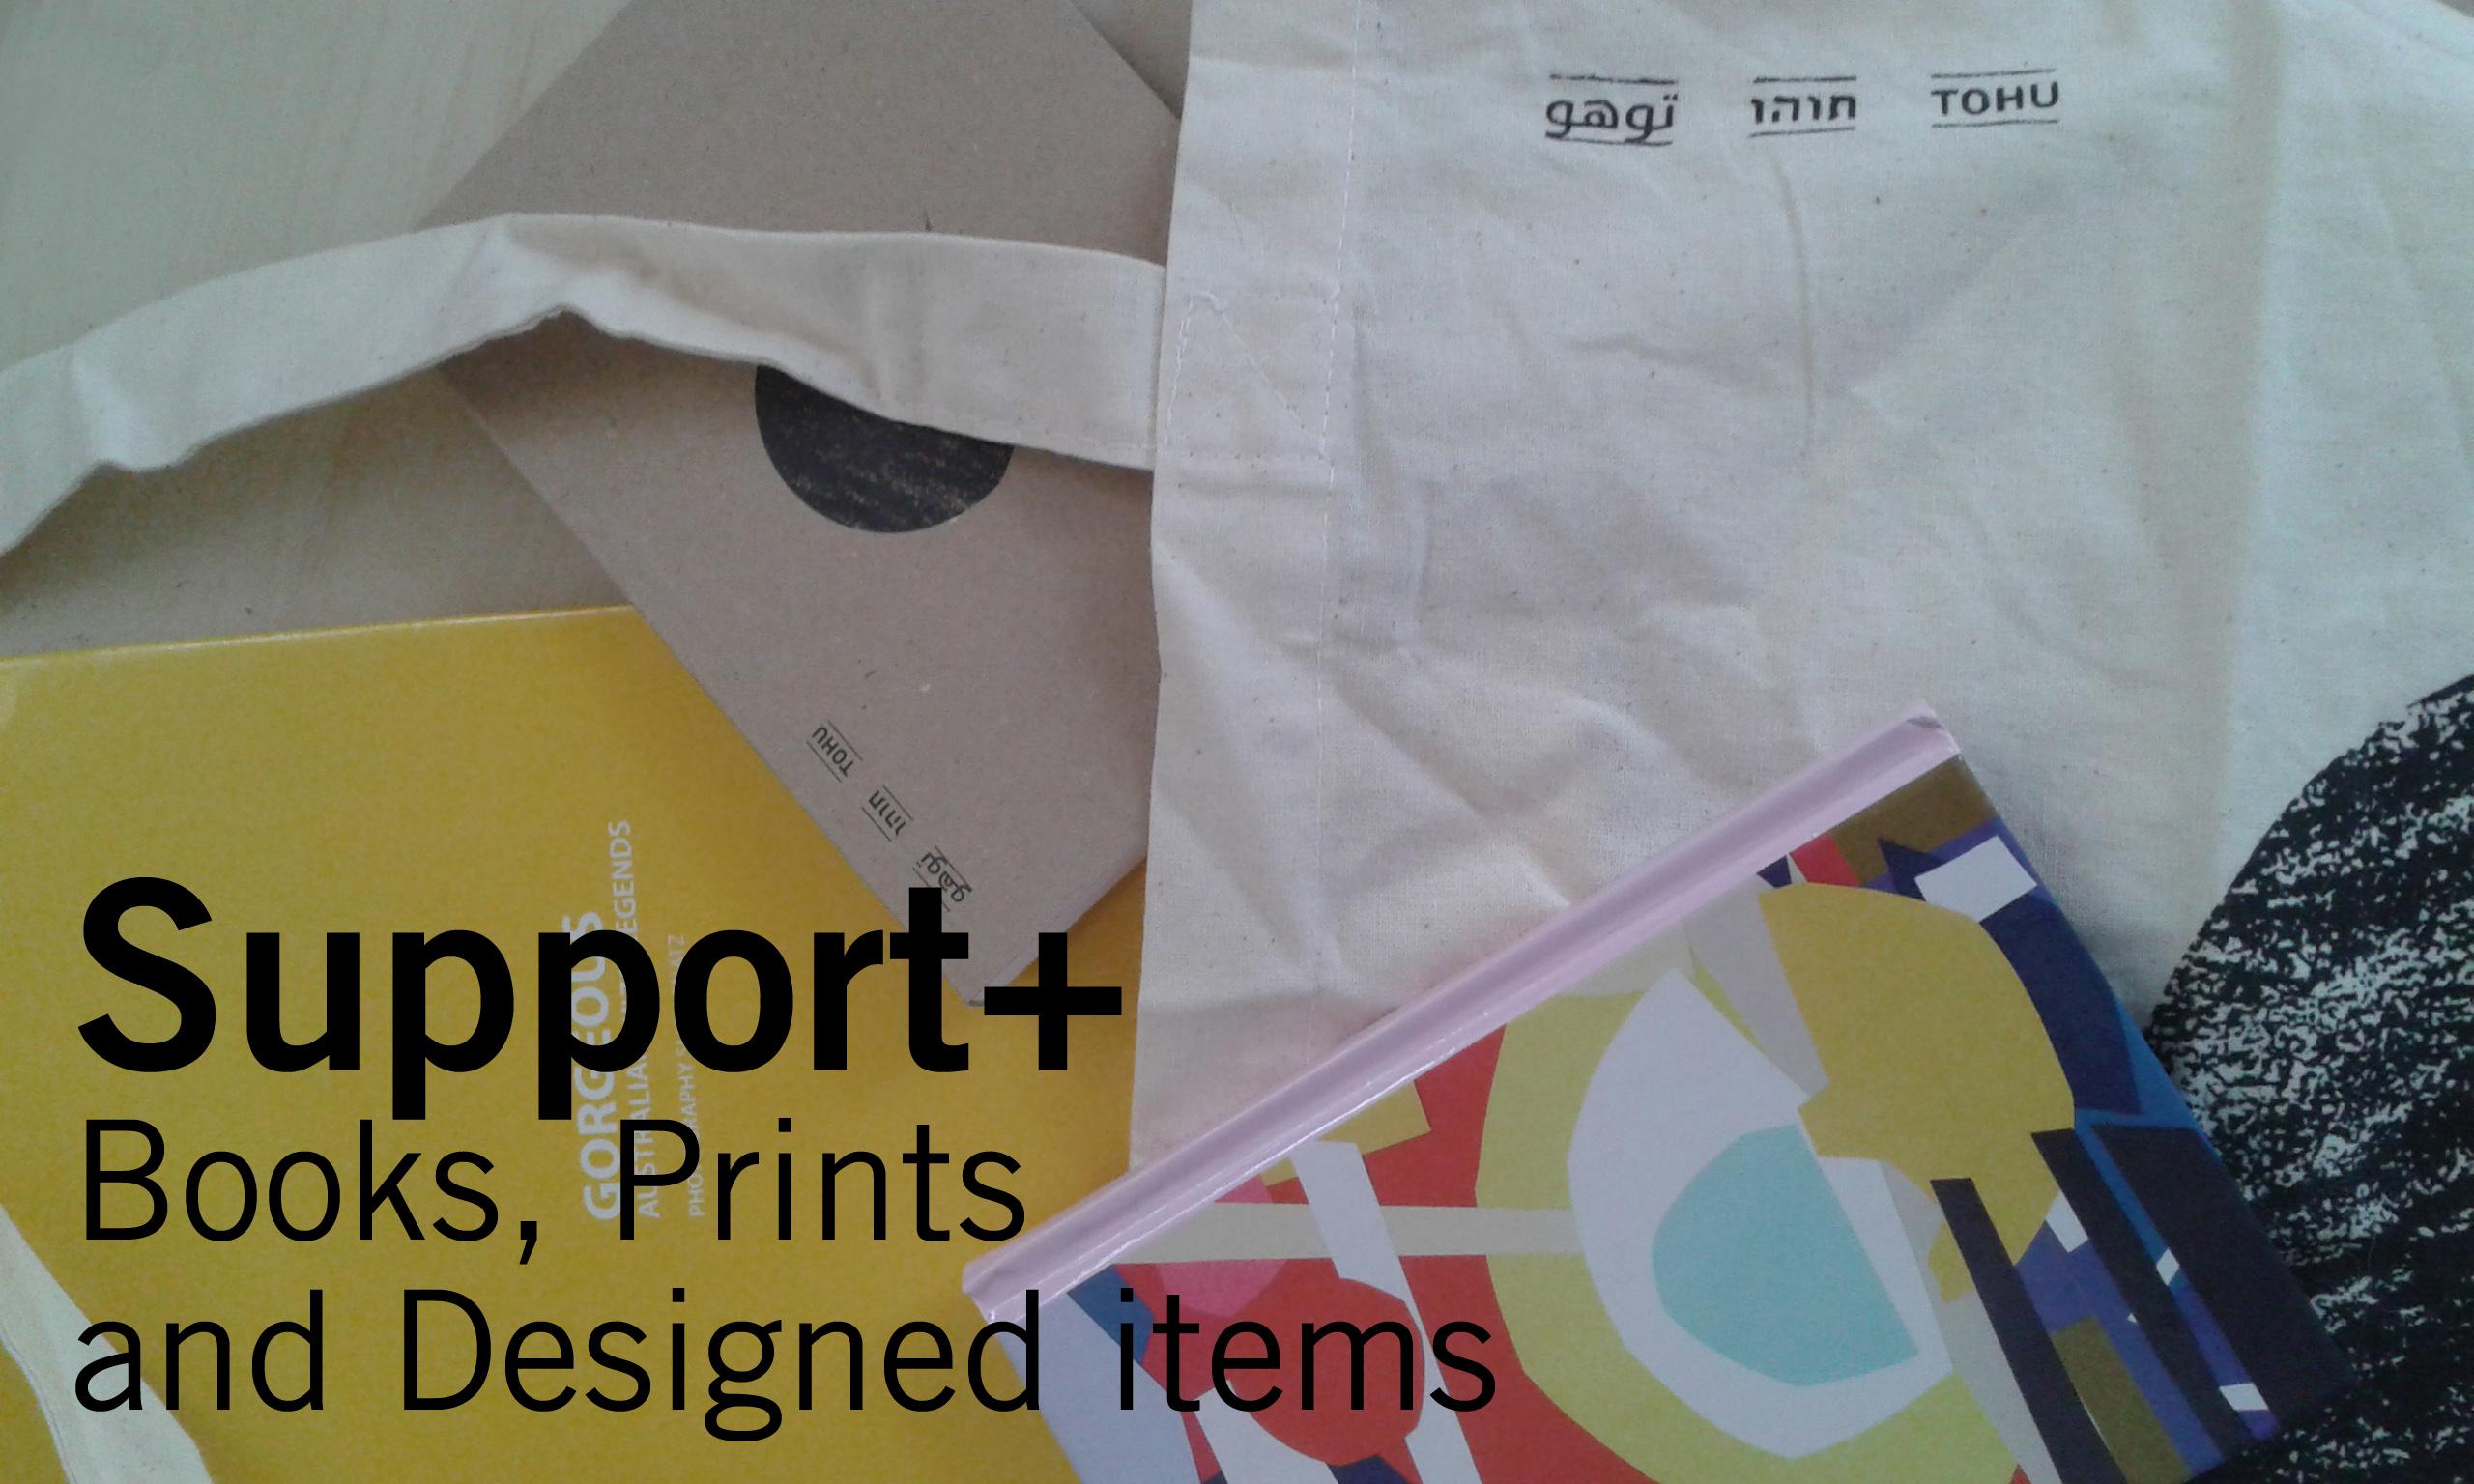 Support+, Tohu, Galia pasternak, Shai Ignatz